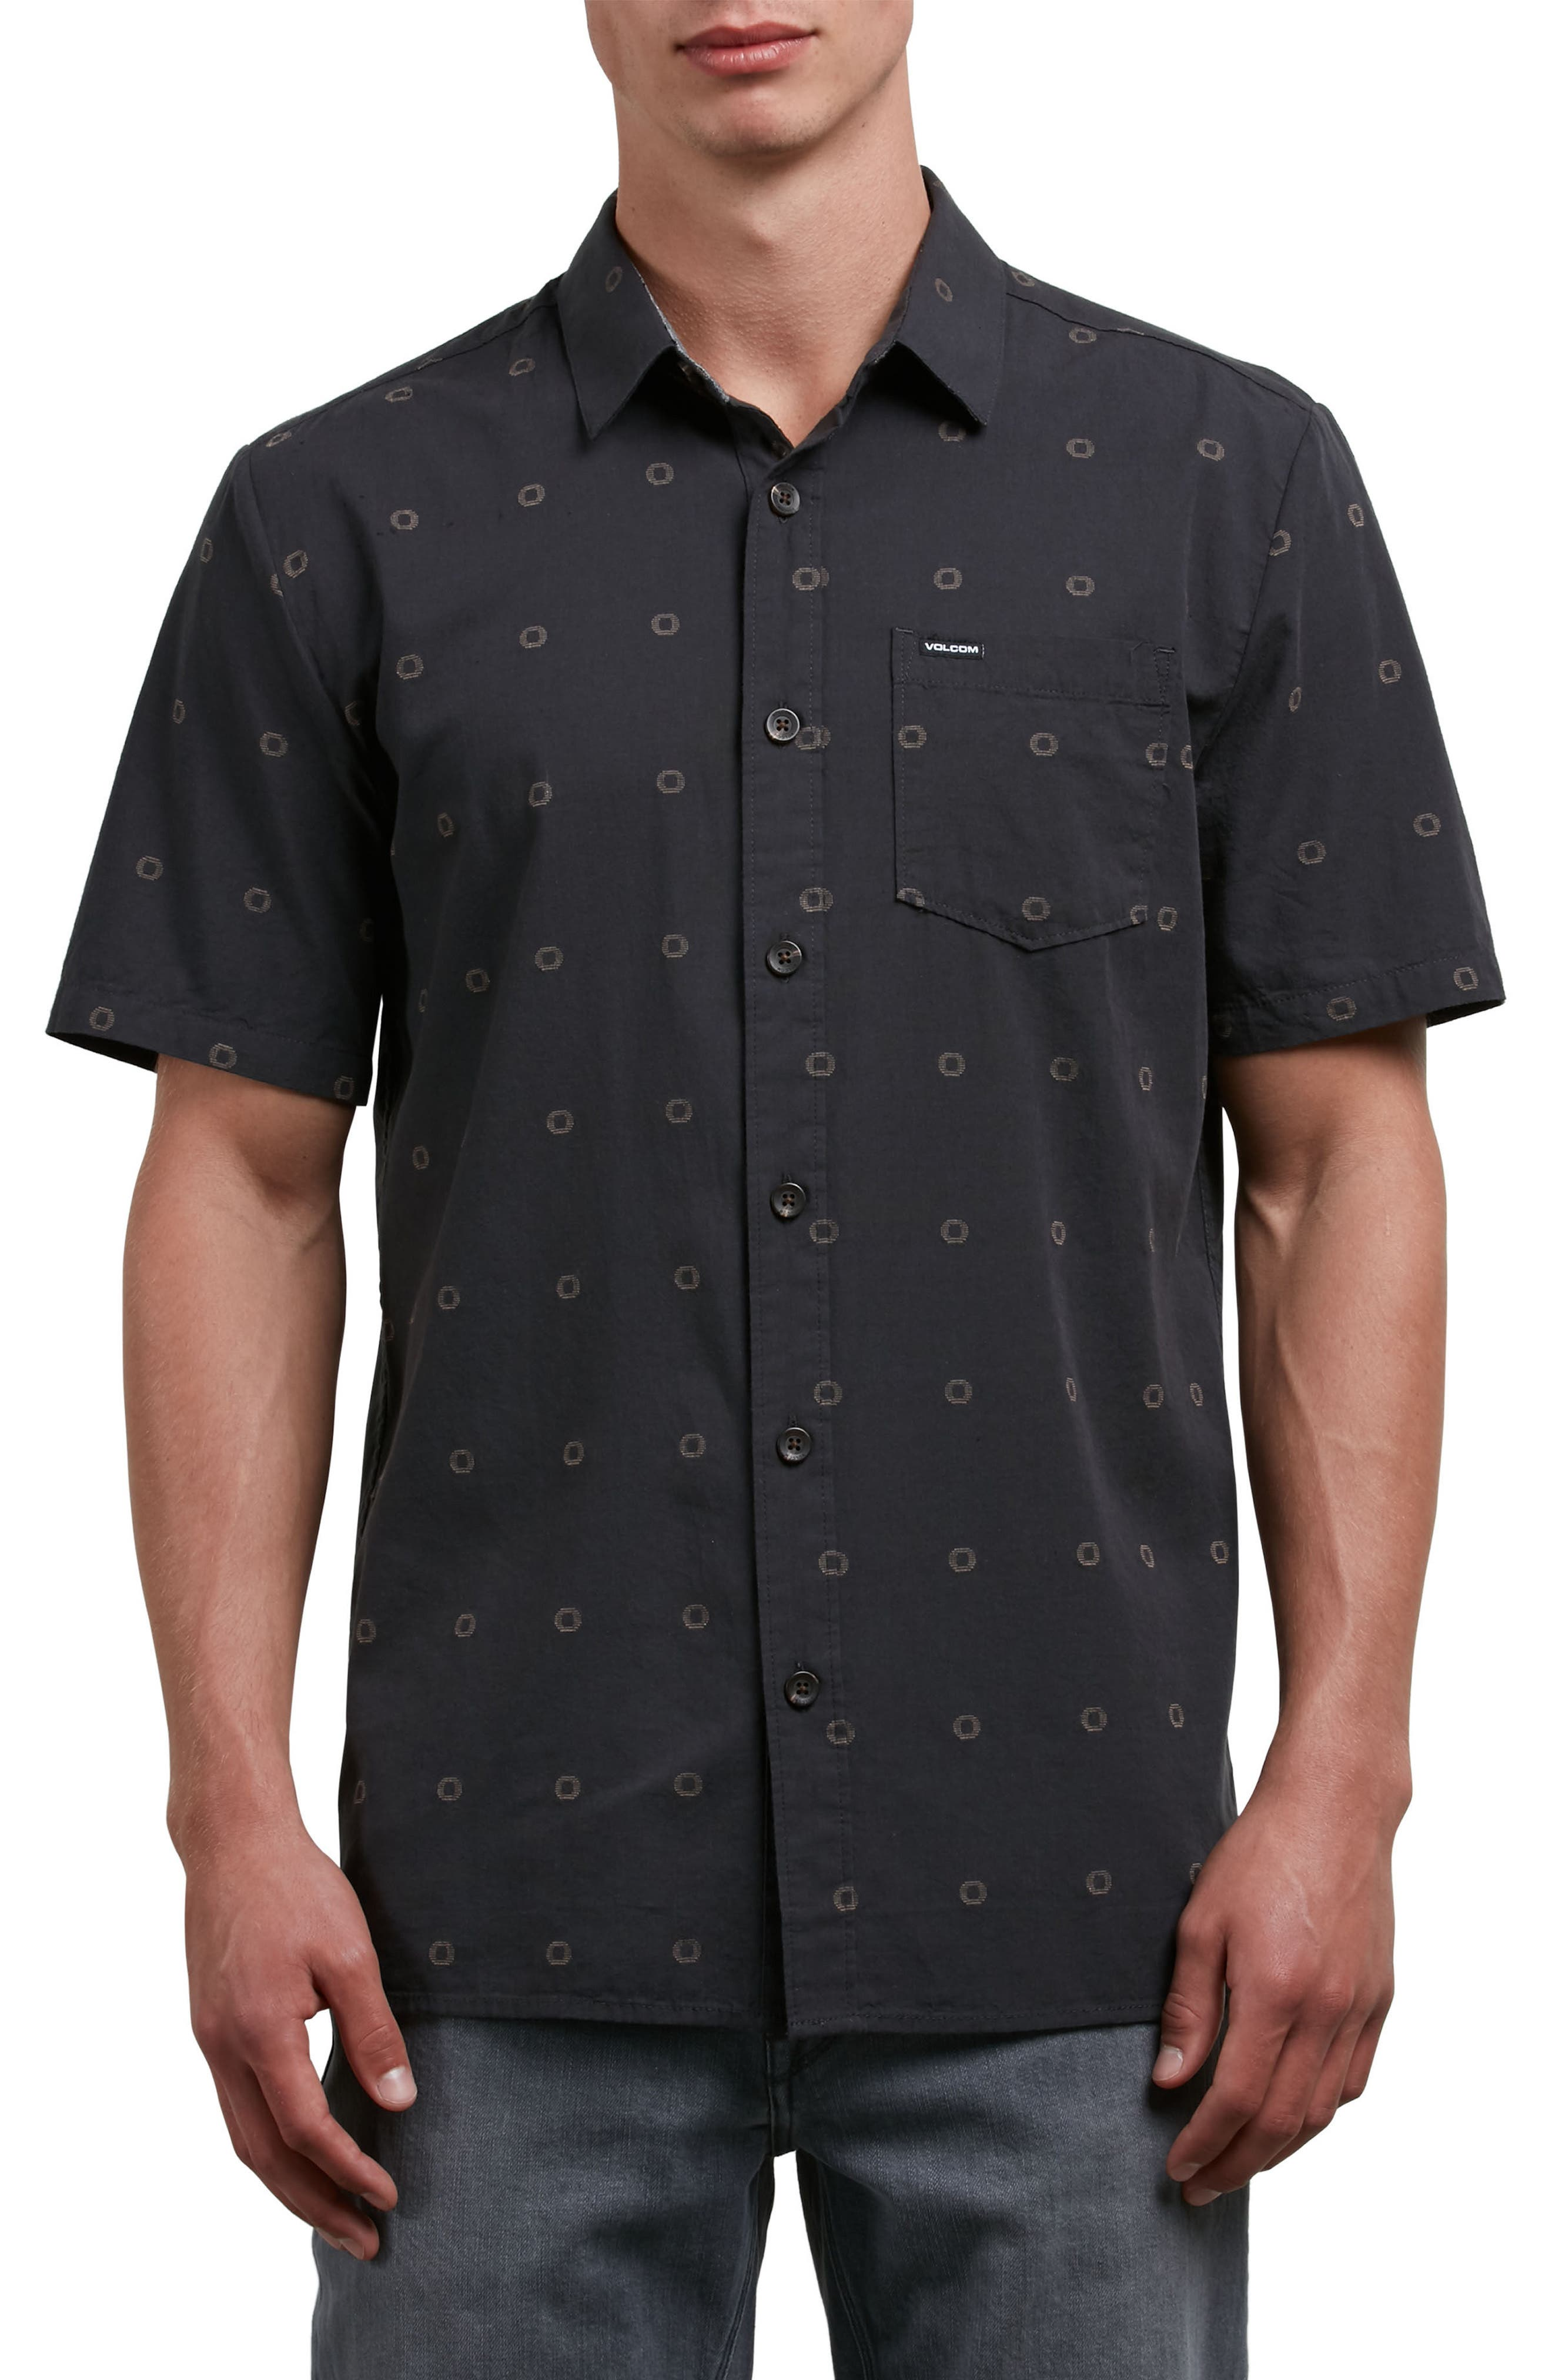 Volcom Trenton Woven Shirt